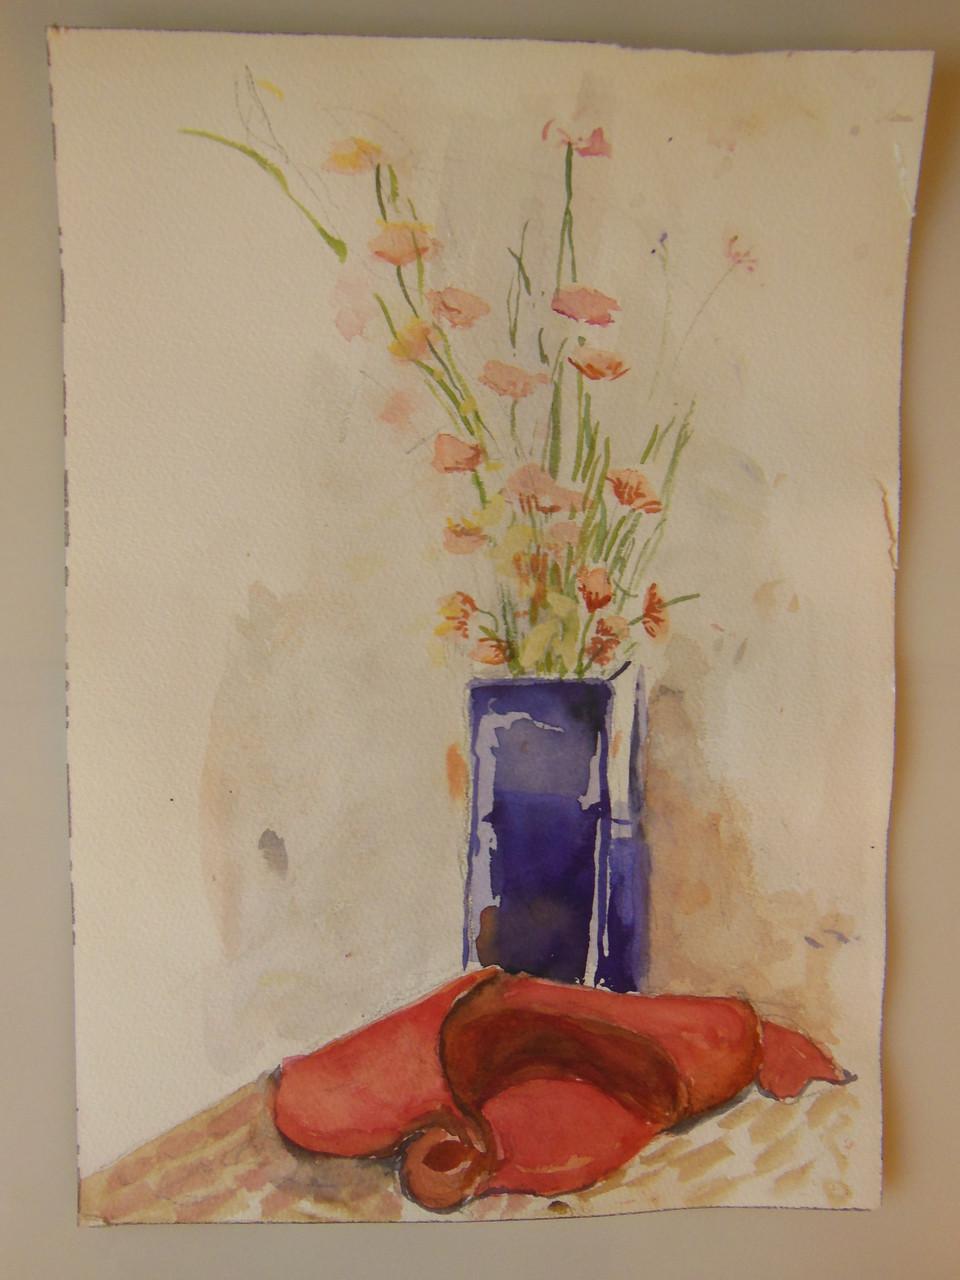 Tamara S Gordon. Still Life. Watercolor on paper-12